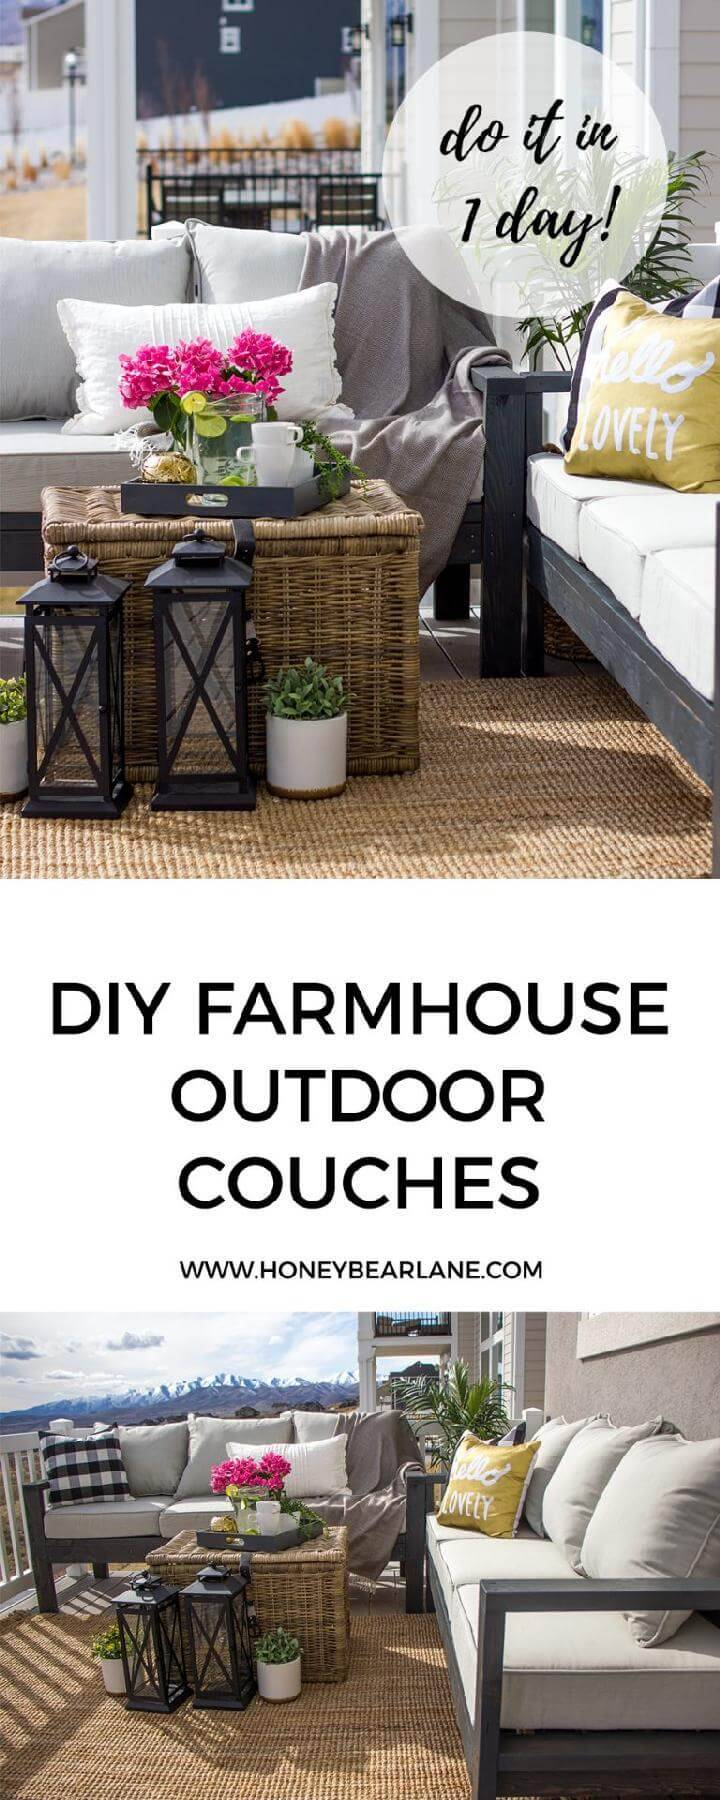 DIY Self-Made Outdoor Furniture